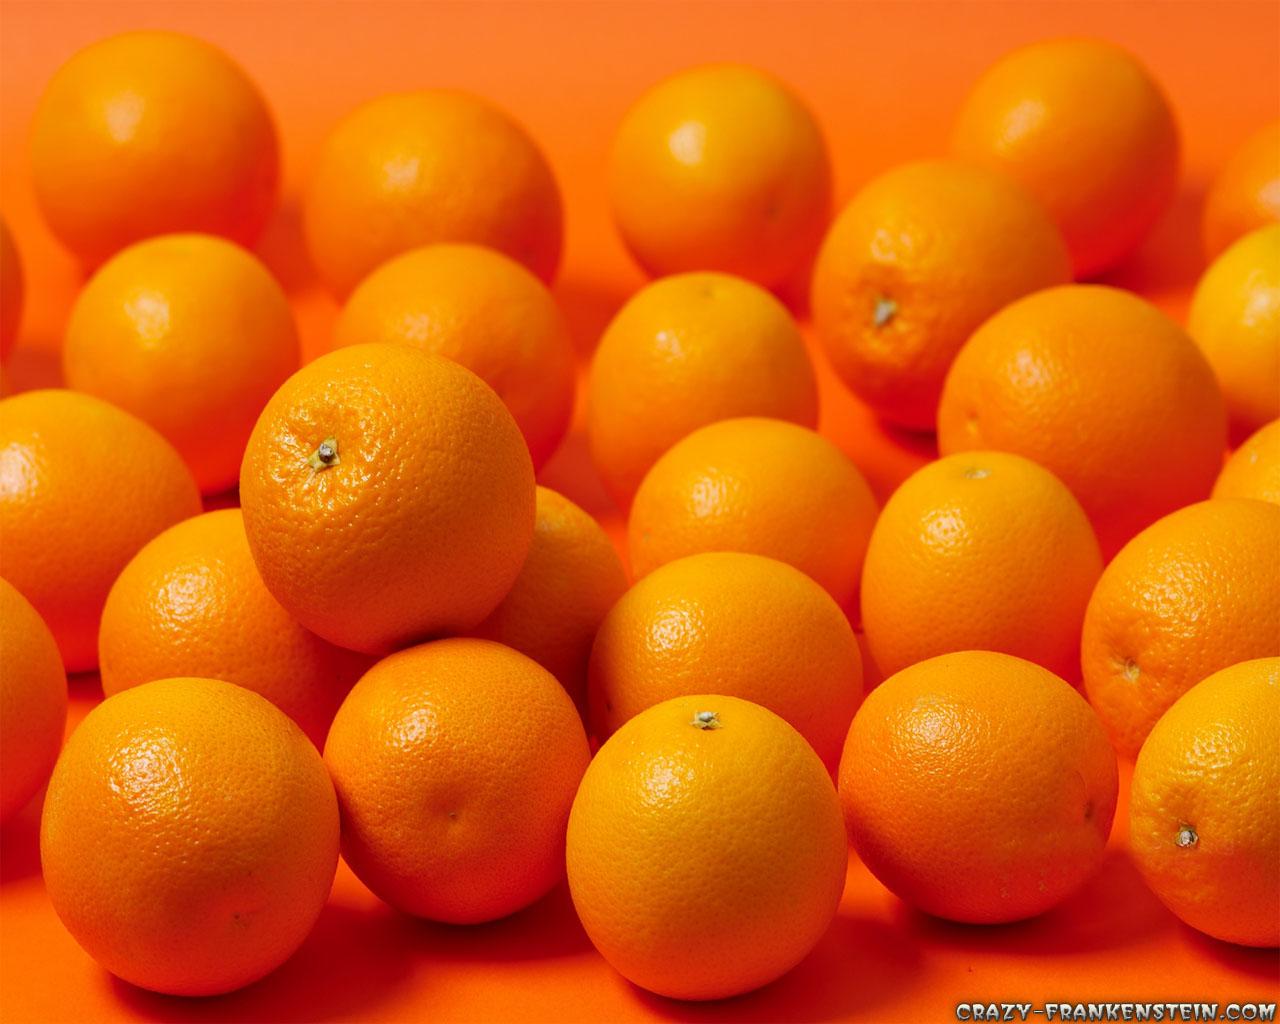 Tesco Orange Juice Carton   kootation 1280x1024